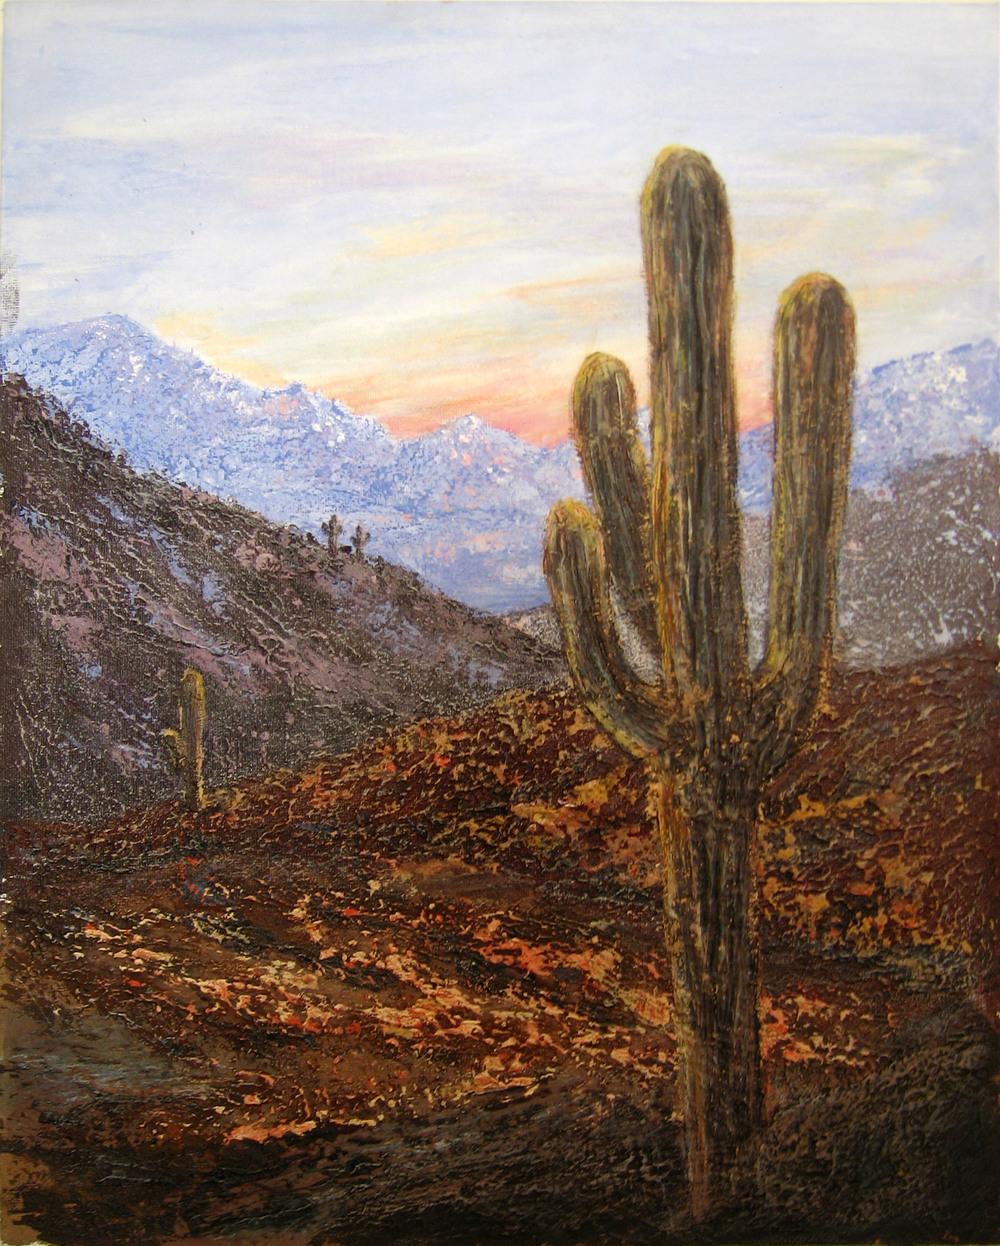 Evening light in Arizona